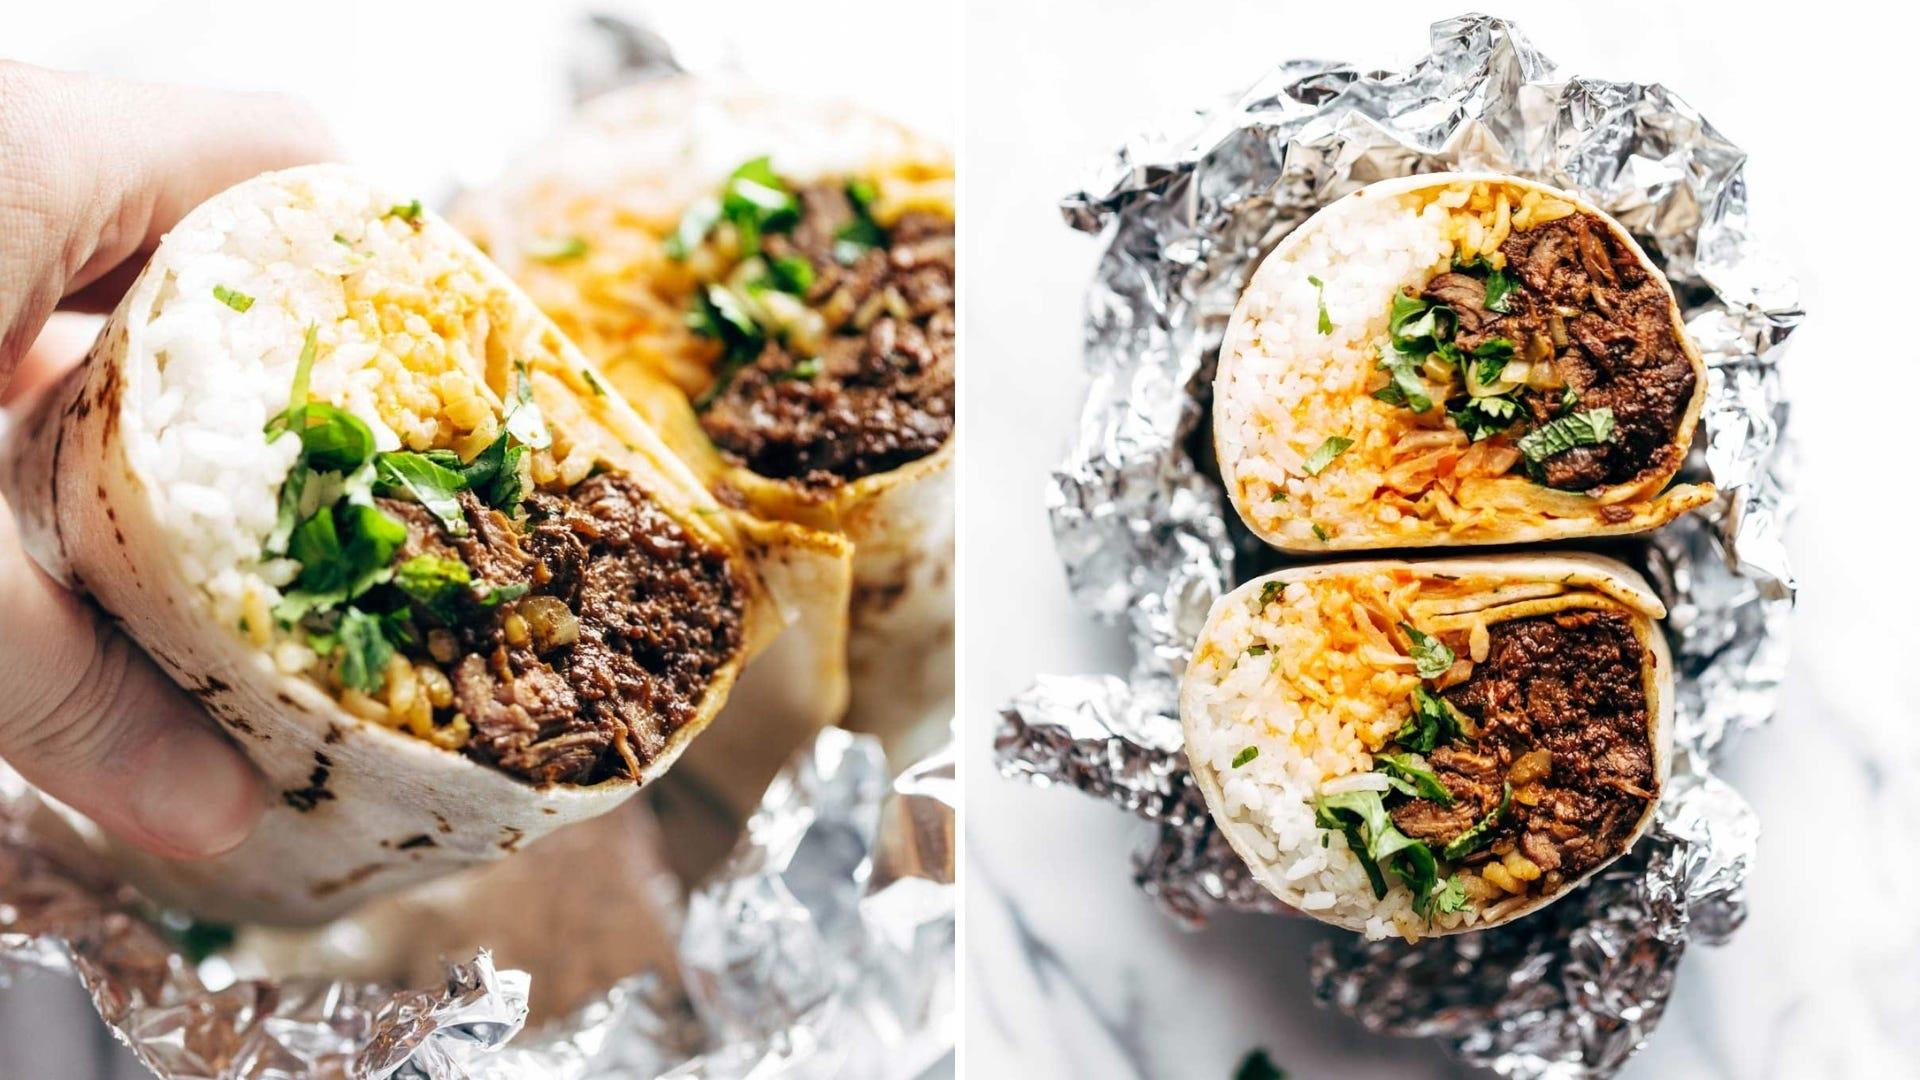 Korean barbecue burrito with meat, rice, and cilantro inside